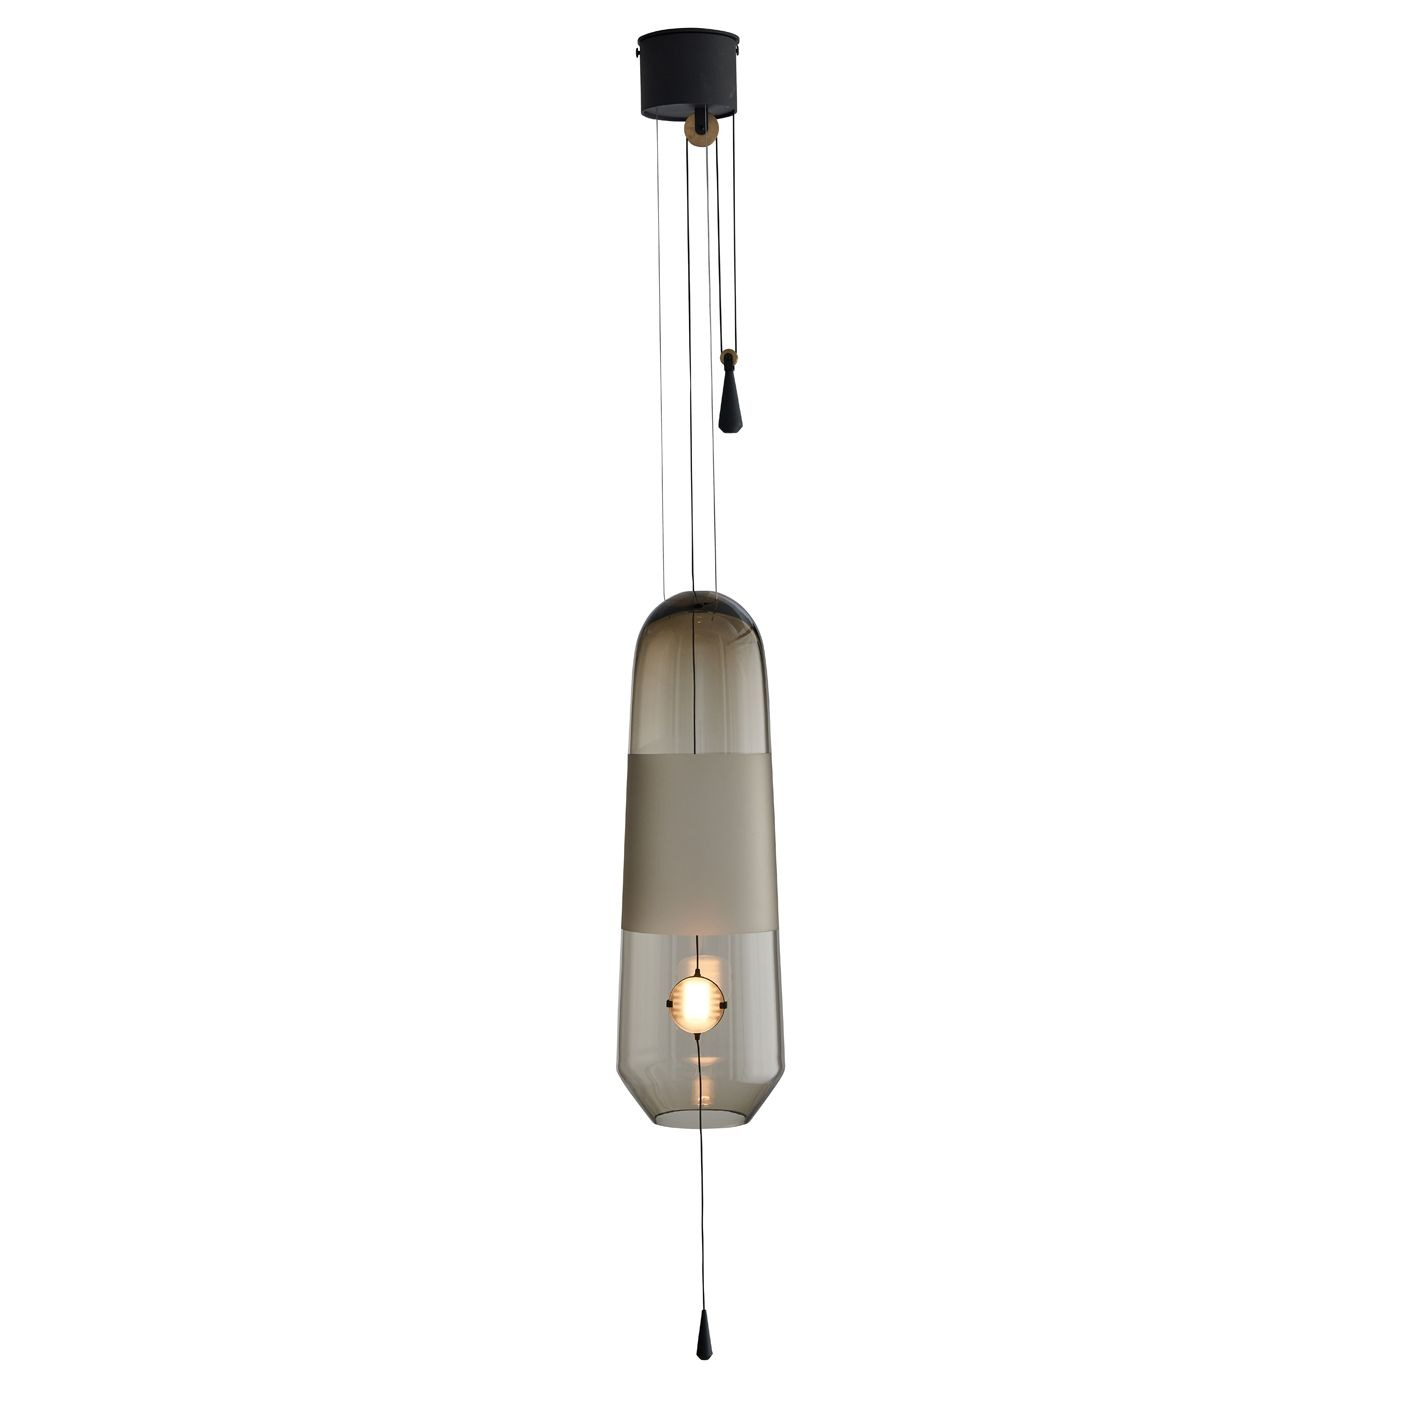 Limpid hanglamp L Hollands Licht gerookt verstelbaar